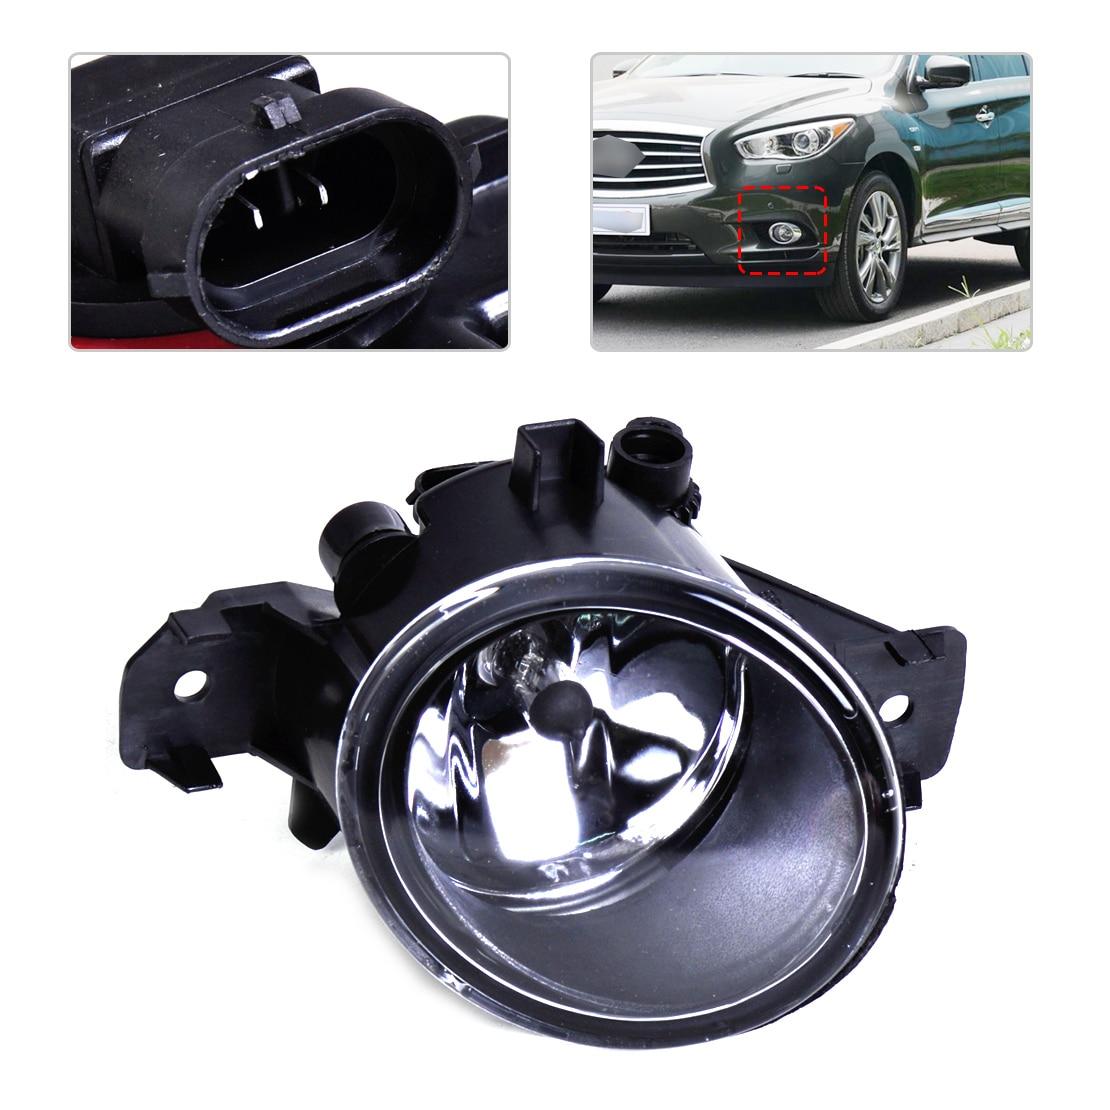 beler 26155-89927 1Pc Left Fog Light Lamp H11 Halogen Bulb Fit for Nissan Sentra Altima Versa Murano Maxima Infiniti G37 JX35